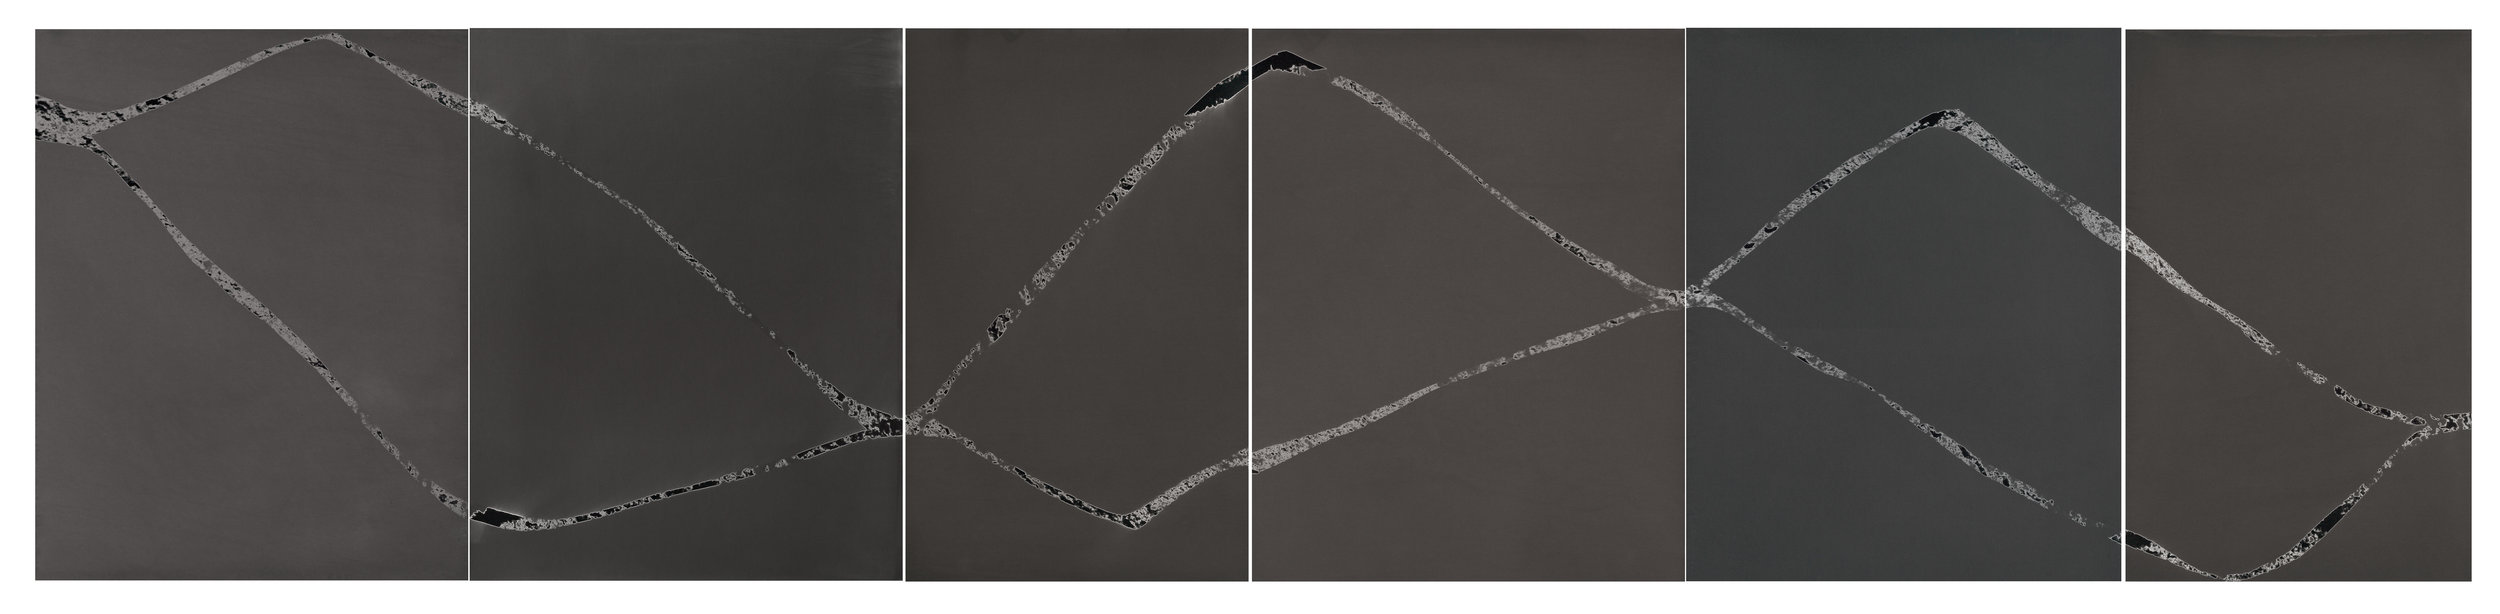 Copy of Confine #200-201-202-203-204-205 by Vittoria Gerardi